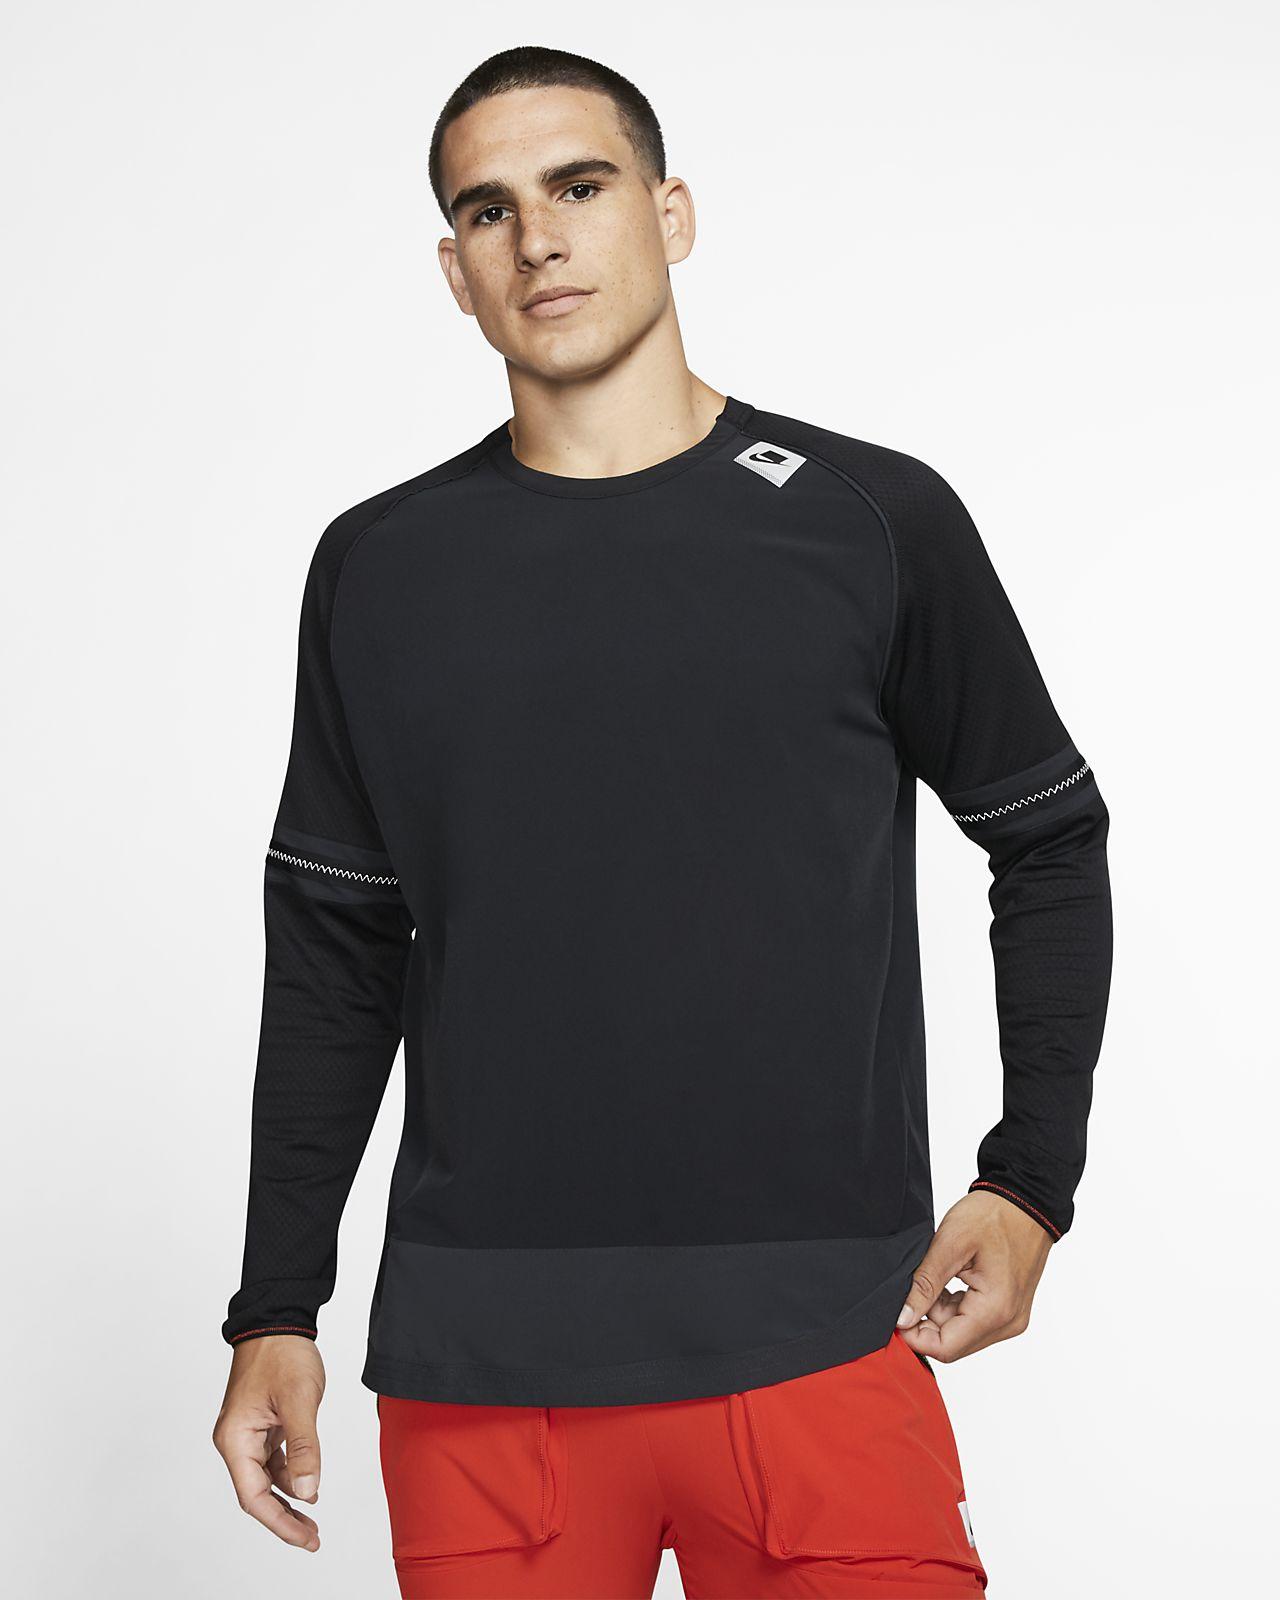 Nike Wild Run Men's Long-Sleeve Running Top